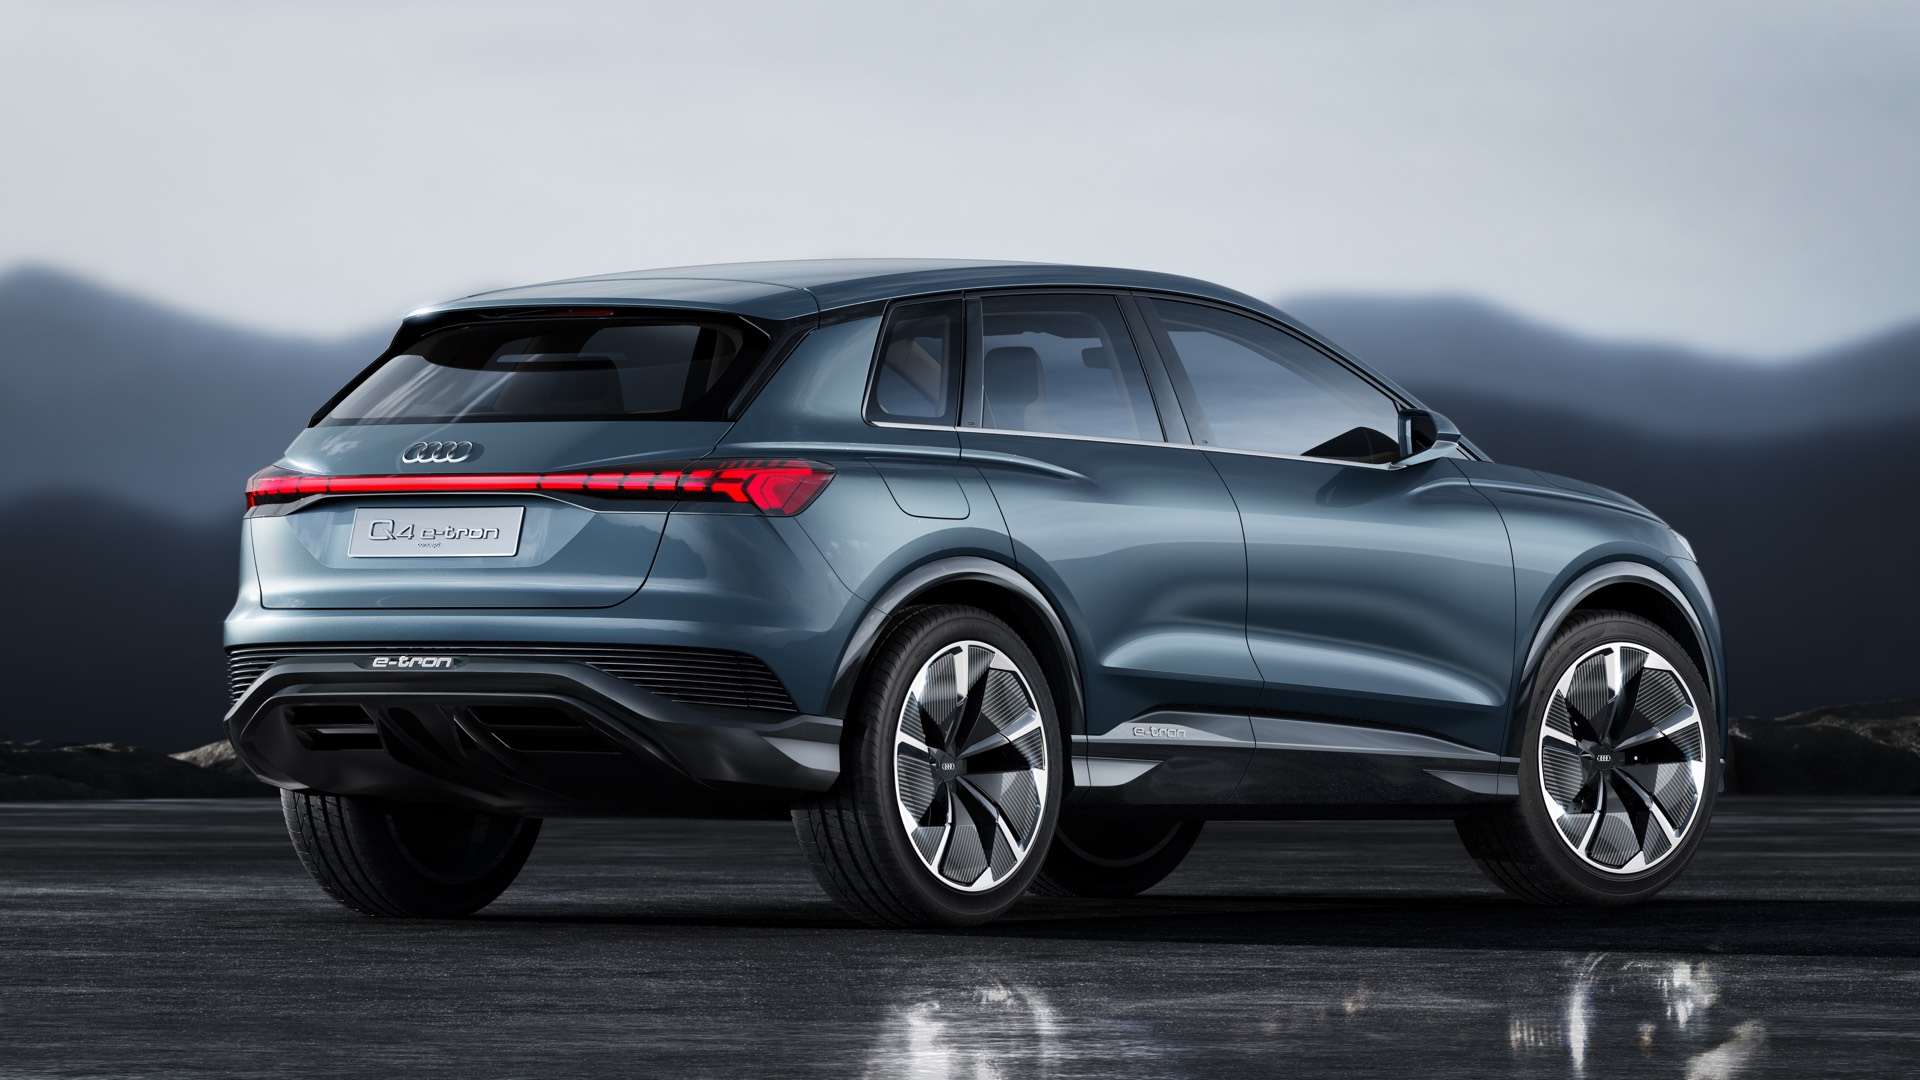 Audi Q4 e-tron Concept Rear